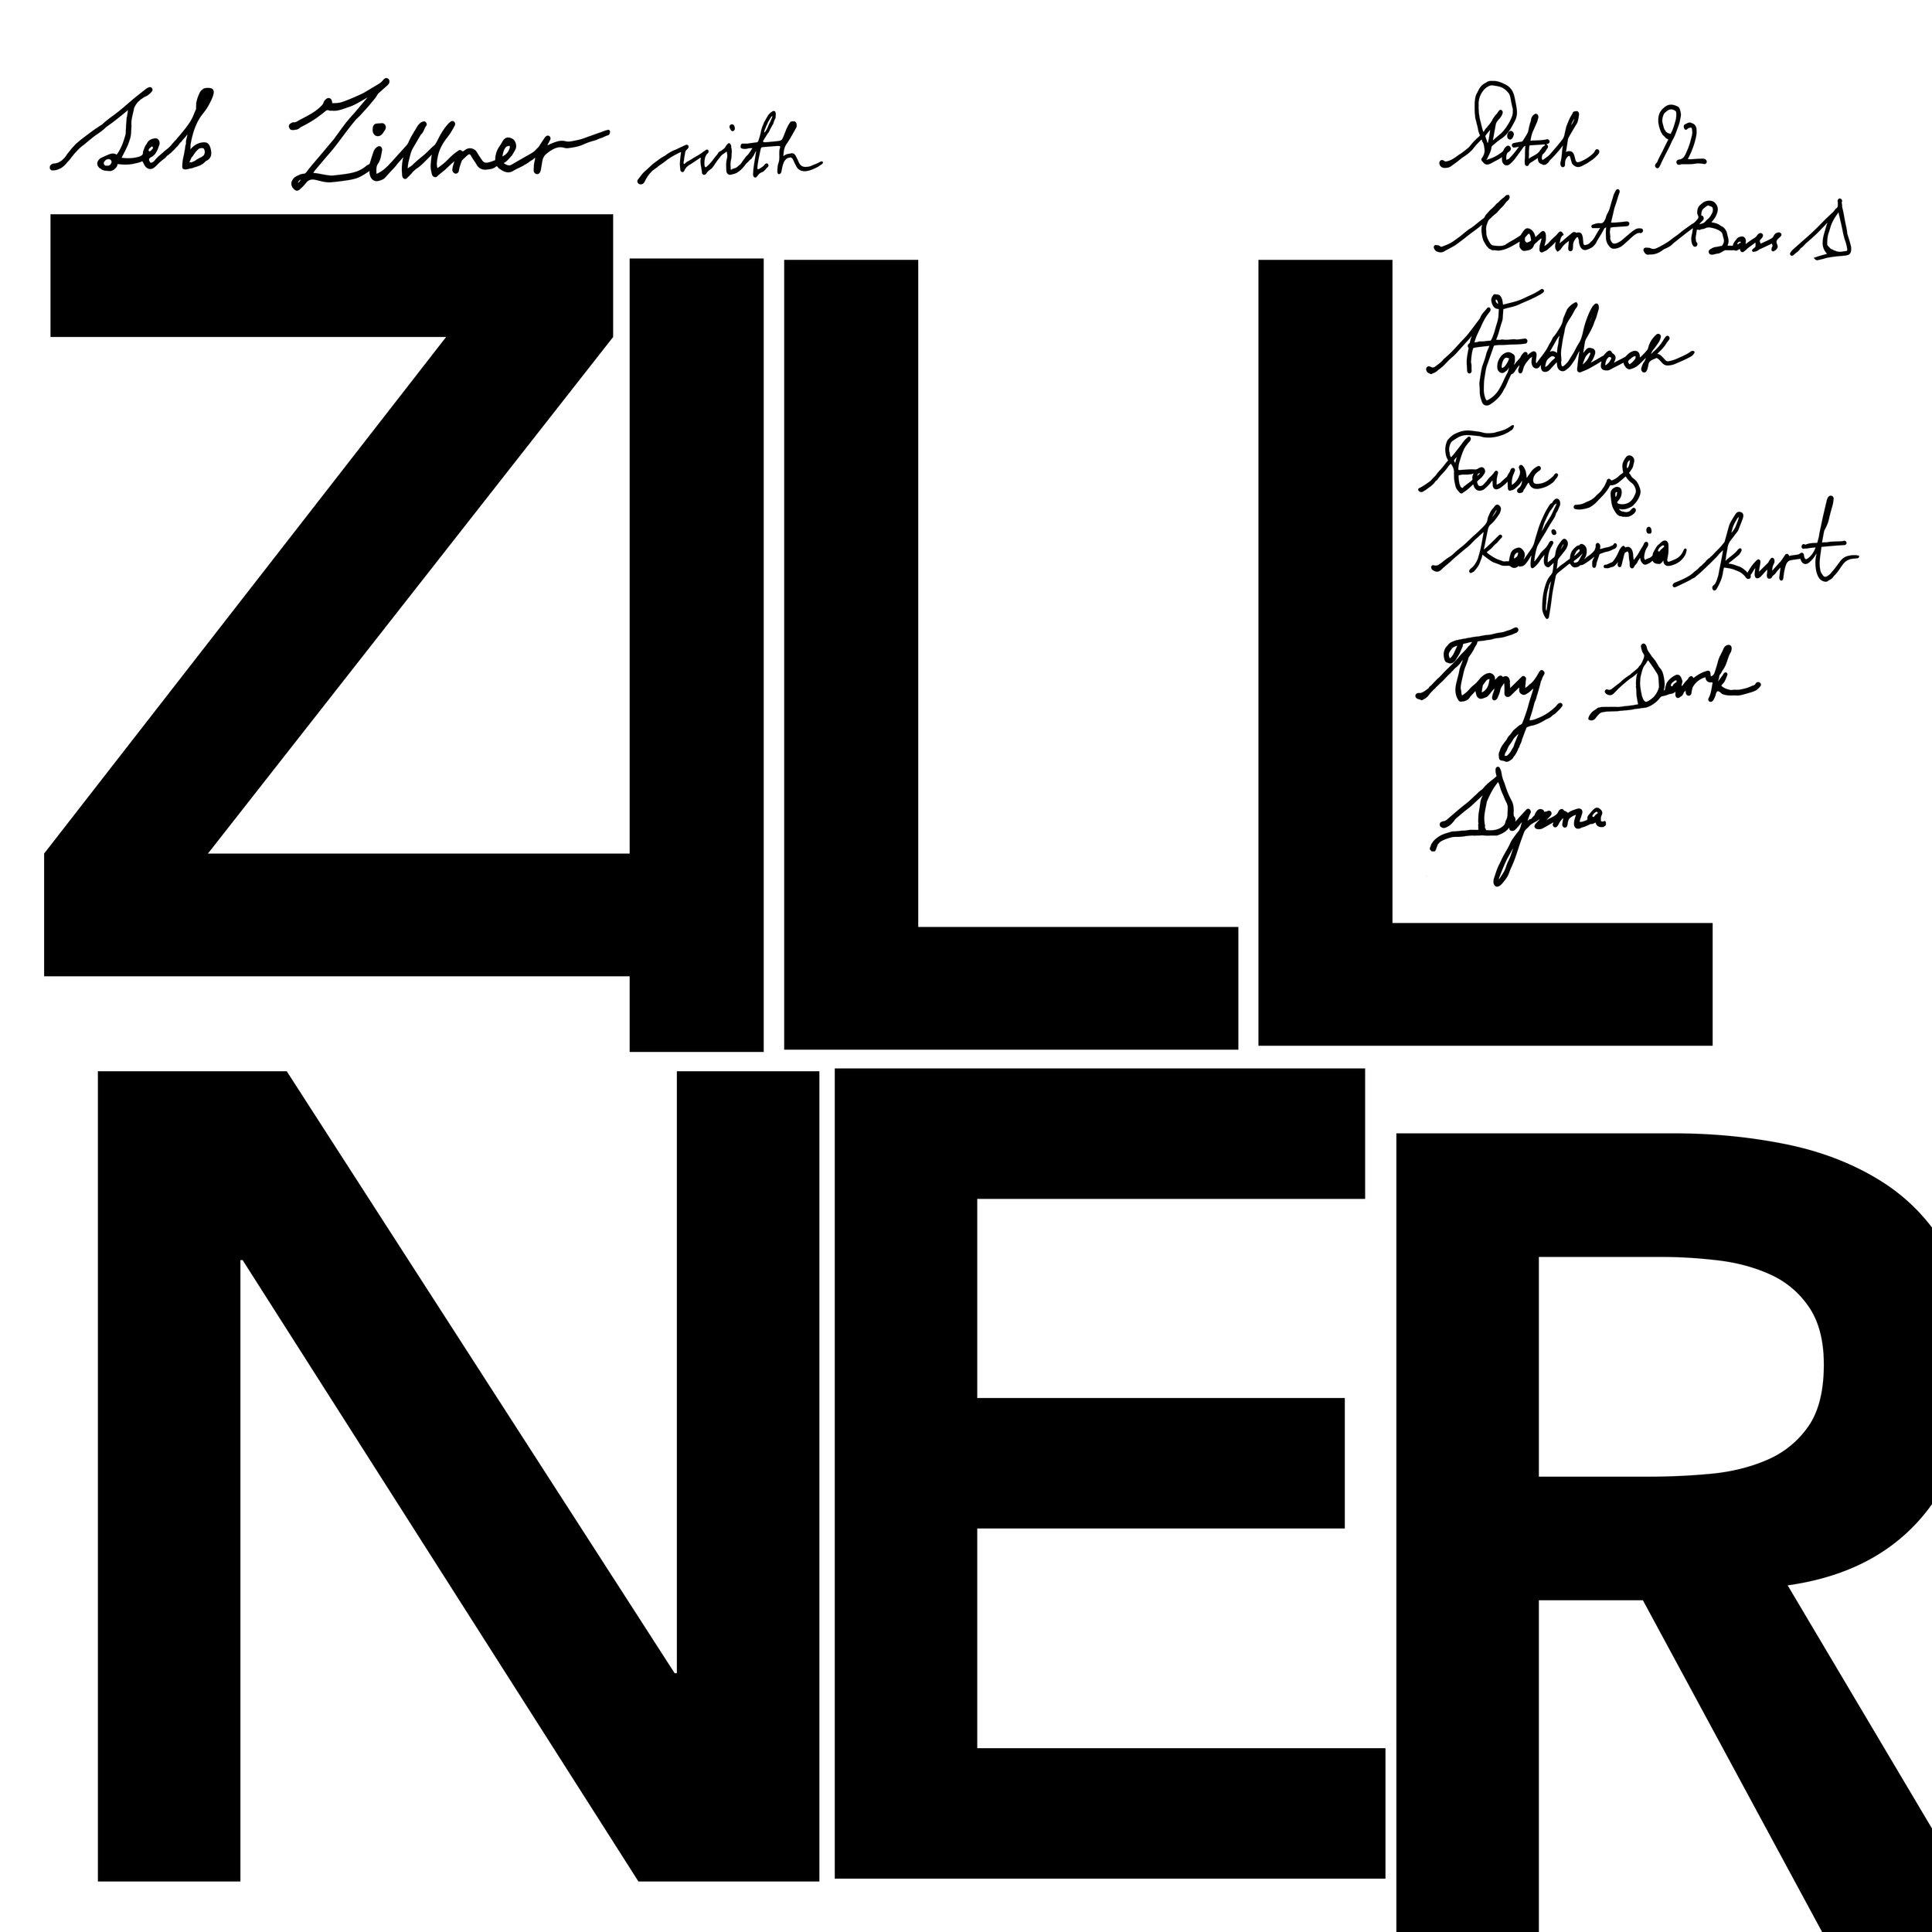 Seb Zillner - ZILLNER   Exectutive Producer  ,   Saxophone, Flute, Duduk & Additional Programming Seb Zillner   © 2018 Pickle Juice  Listen on Spotify